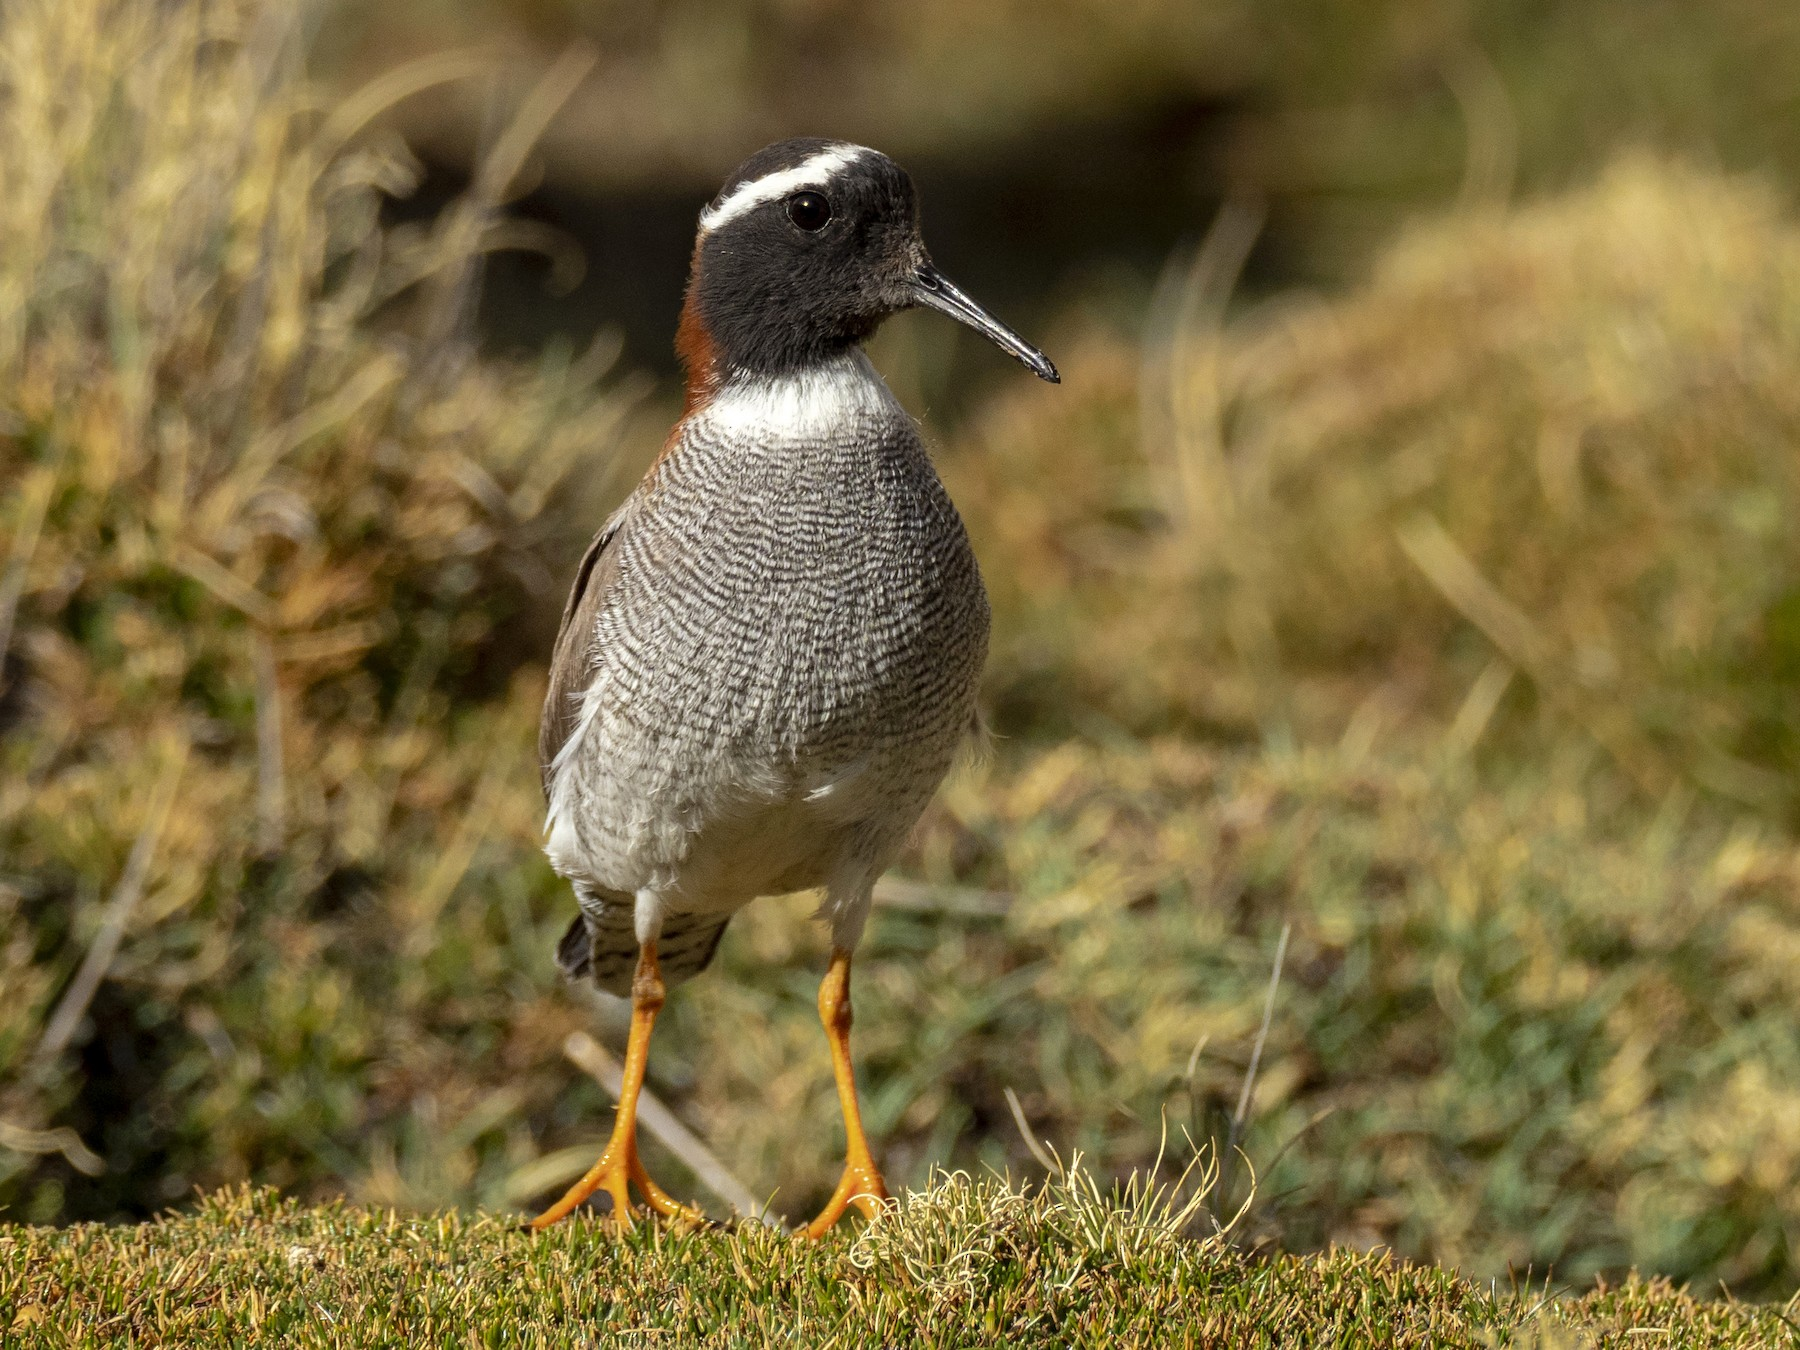 Diademed Sandpiper-Plover - Andres Vasquez Noboa - Tropical Birding Tours